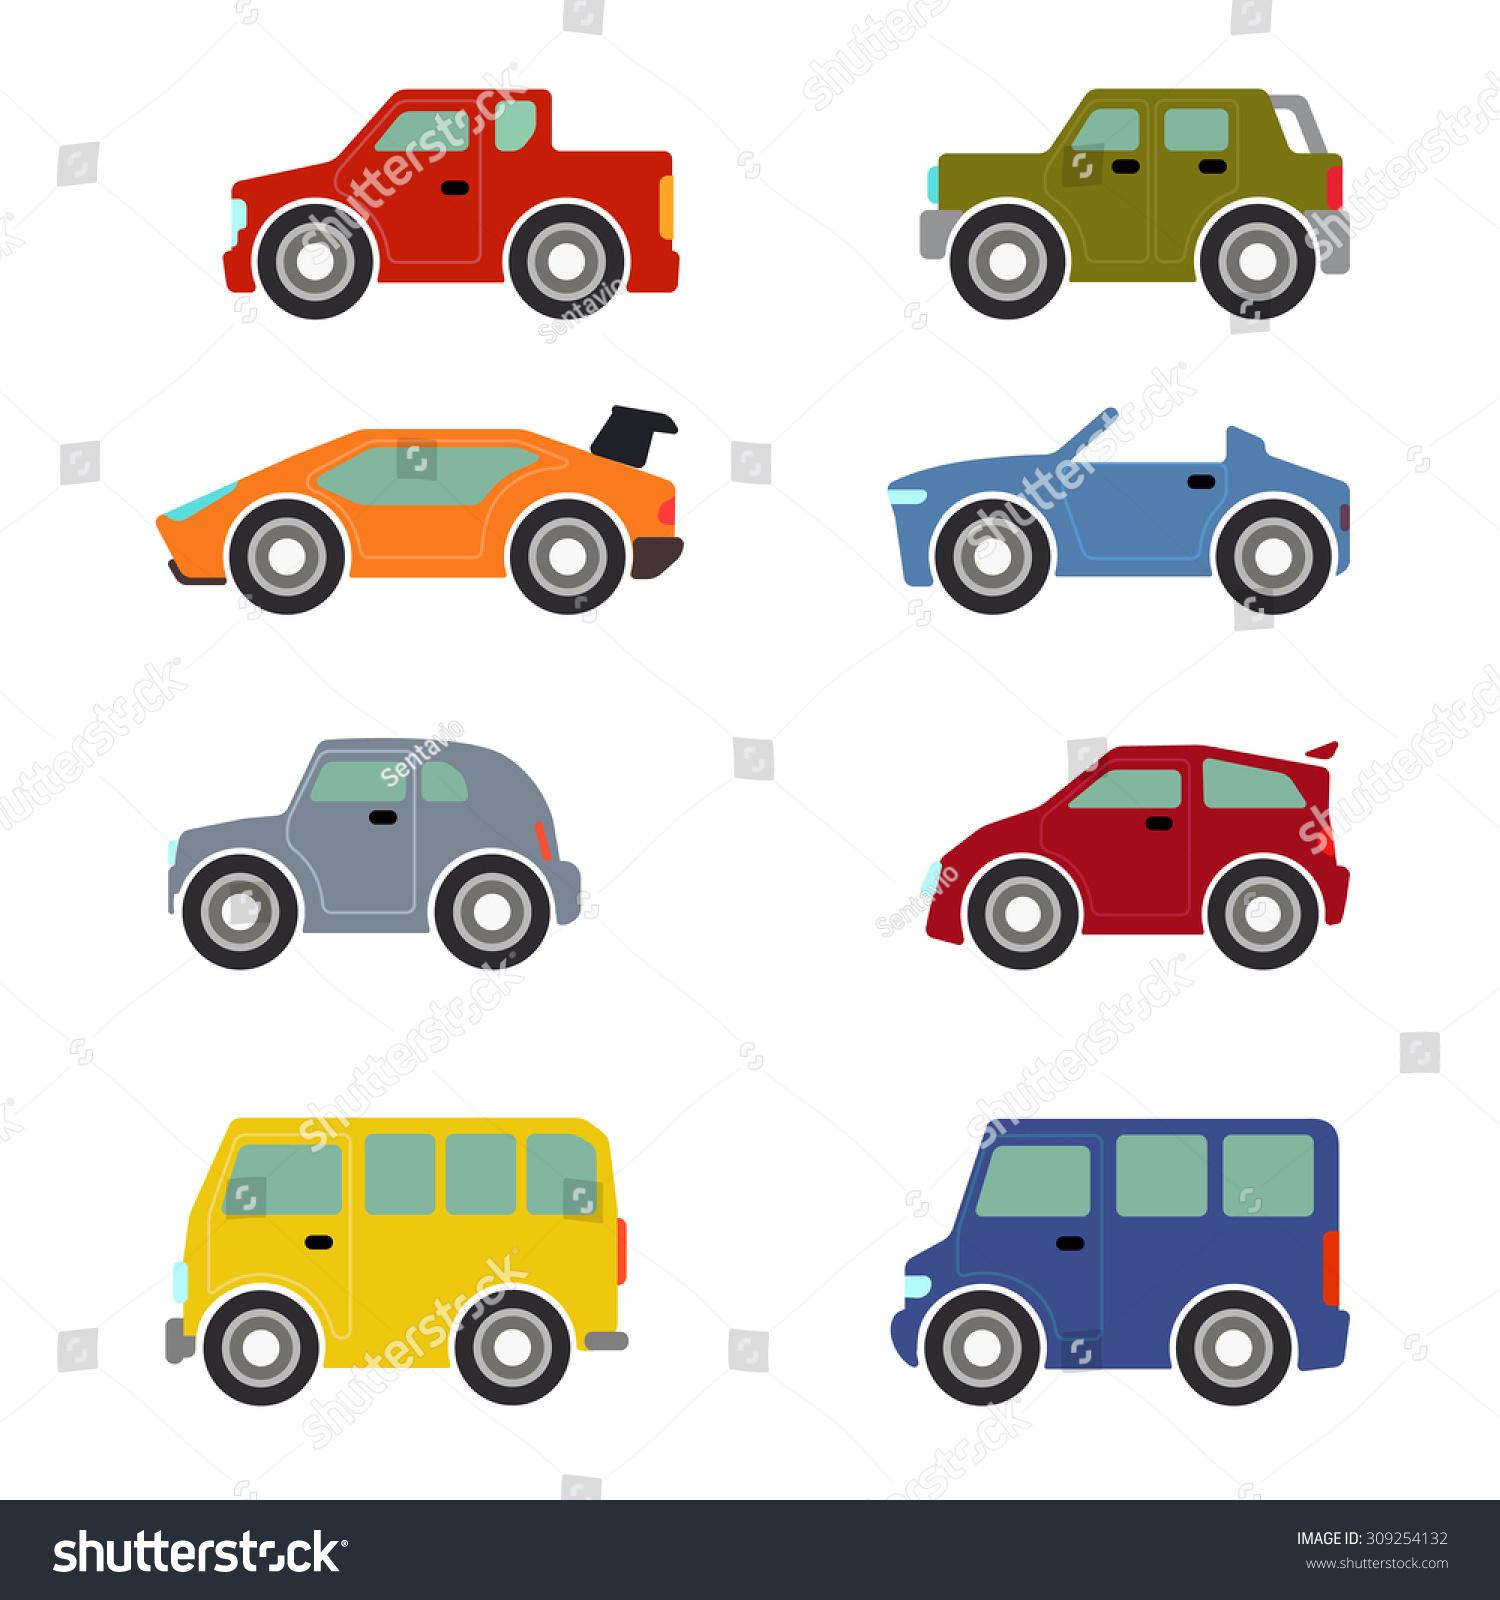 Flat Funny Cartoon Road Transport Icon Stock Vector